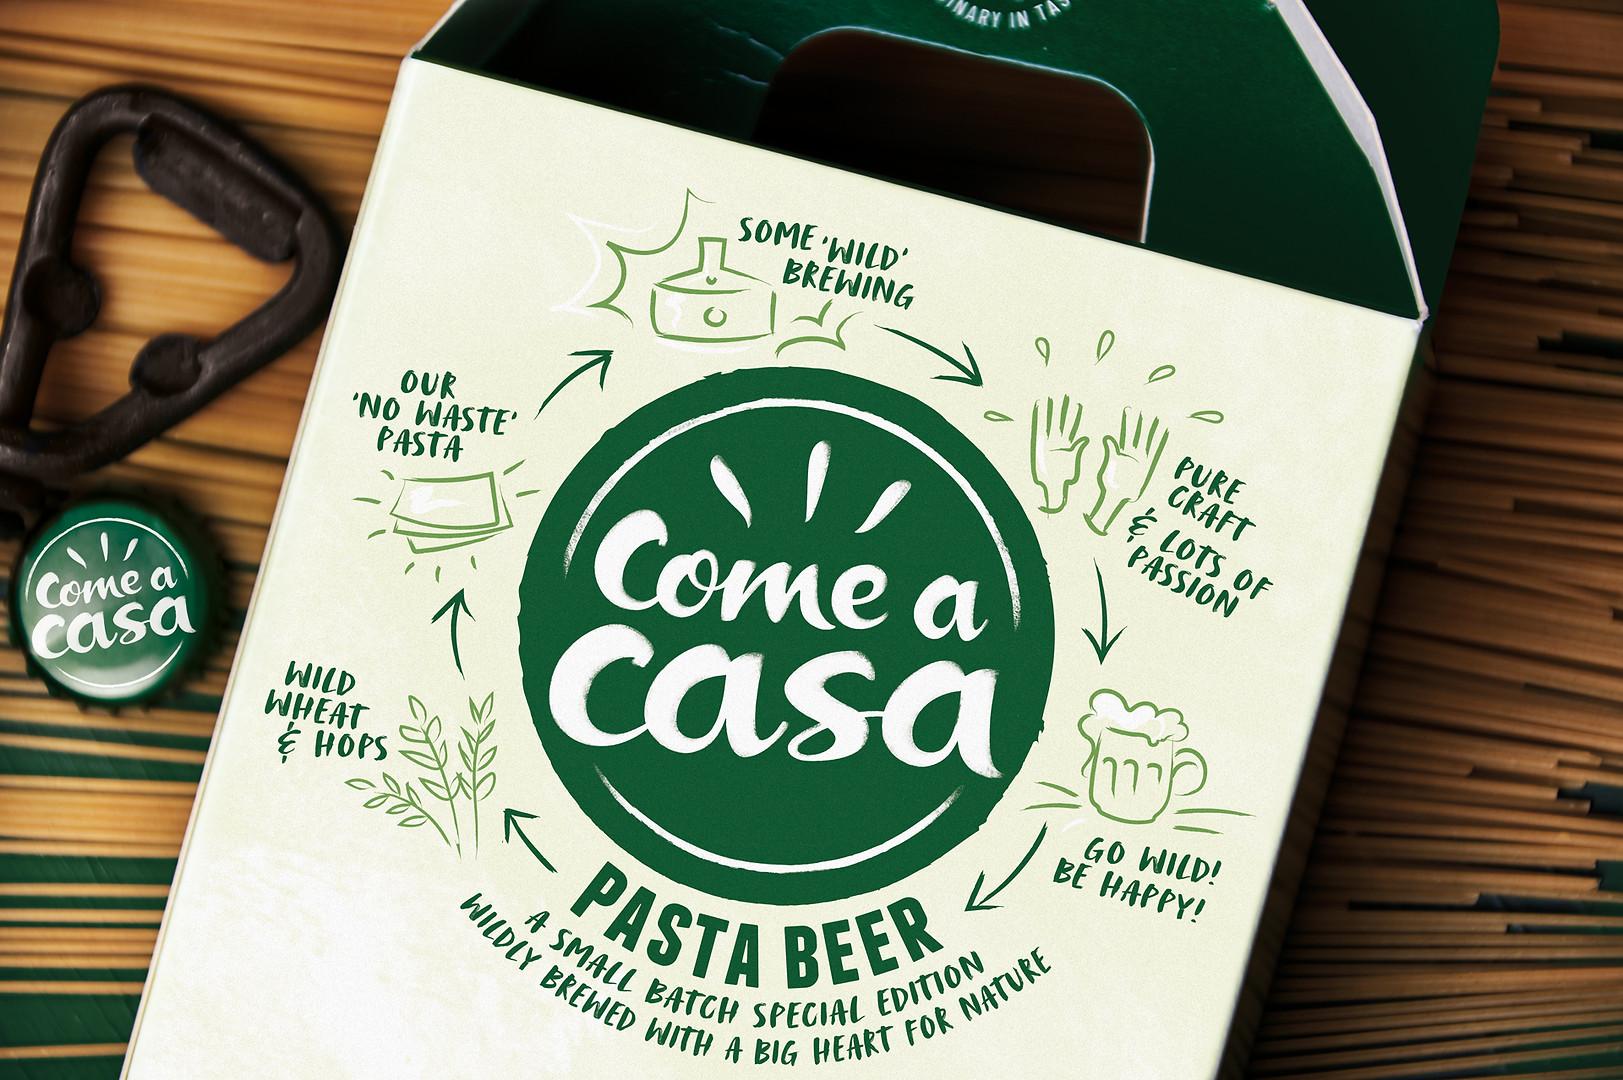 CAC---Pasta-bier---Back-box.jpg